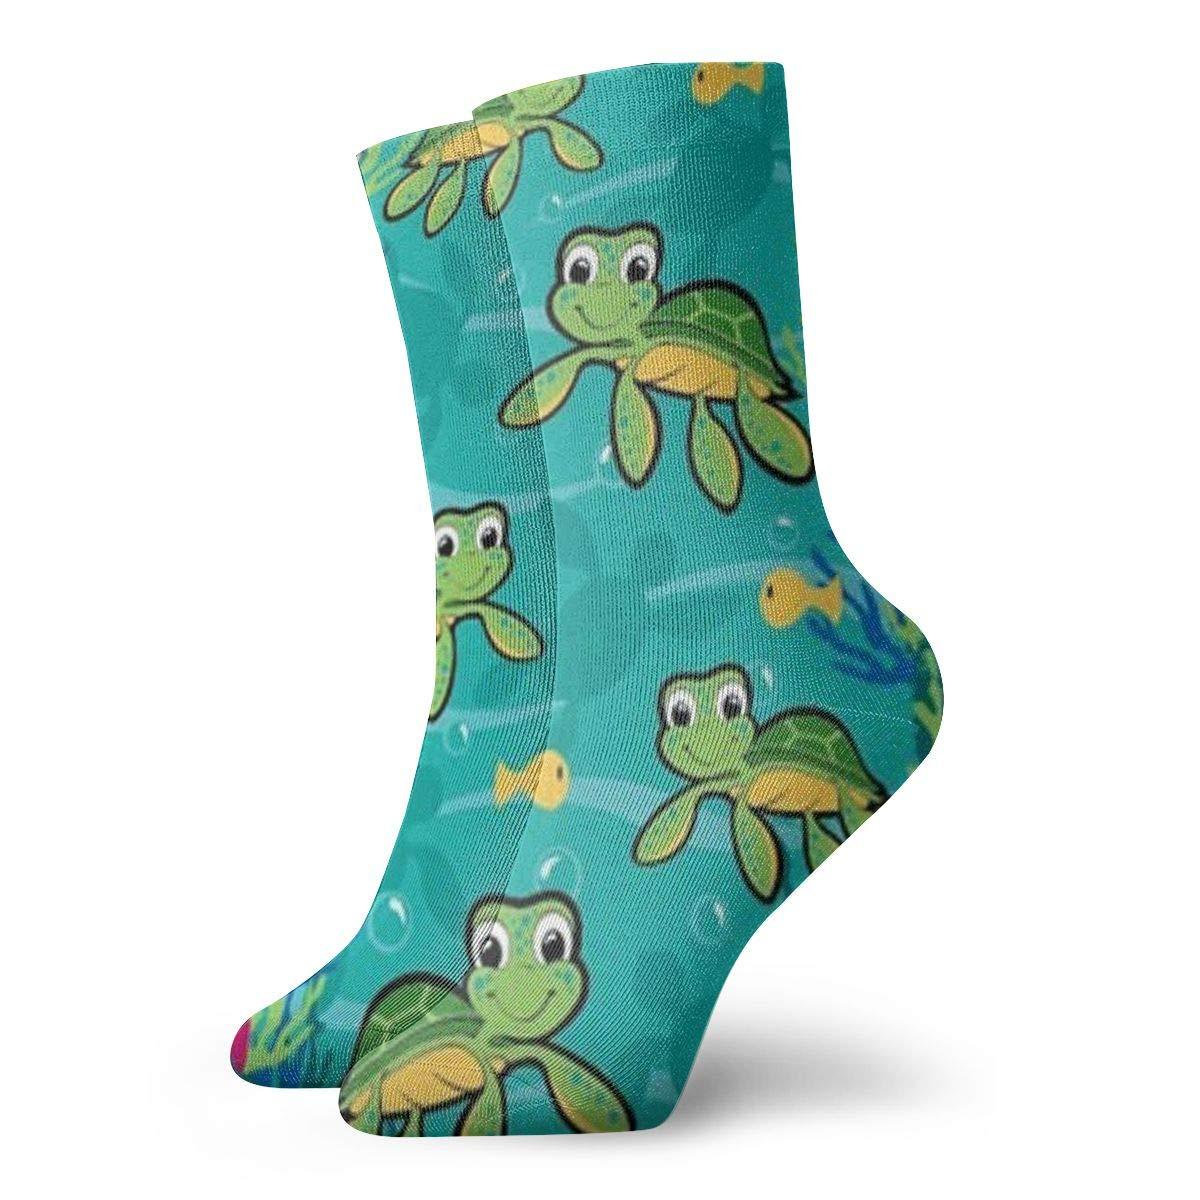 Cartoon Tortoise Unisex Funny Casual Crew Socks Athletic Socks For Boys Girls Kids Teenagers